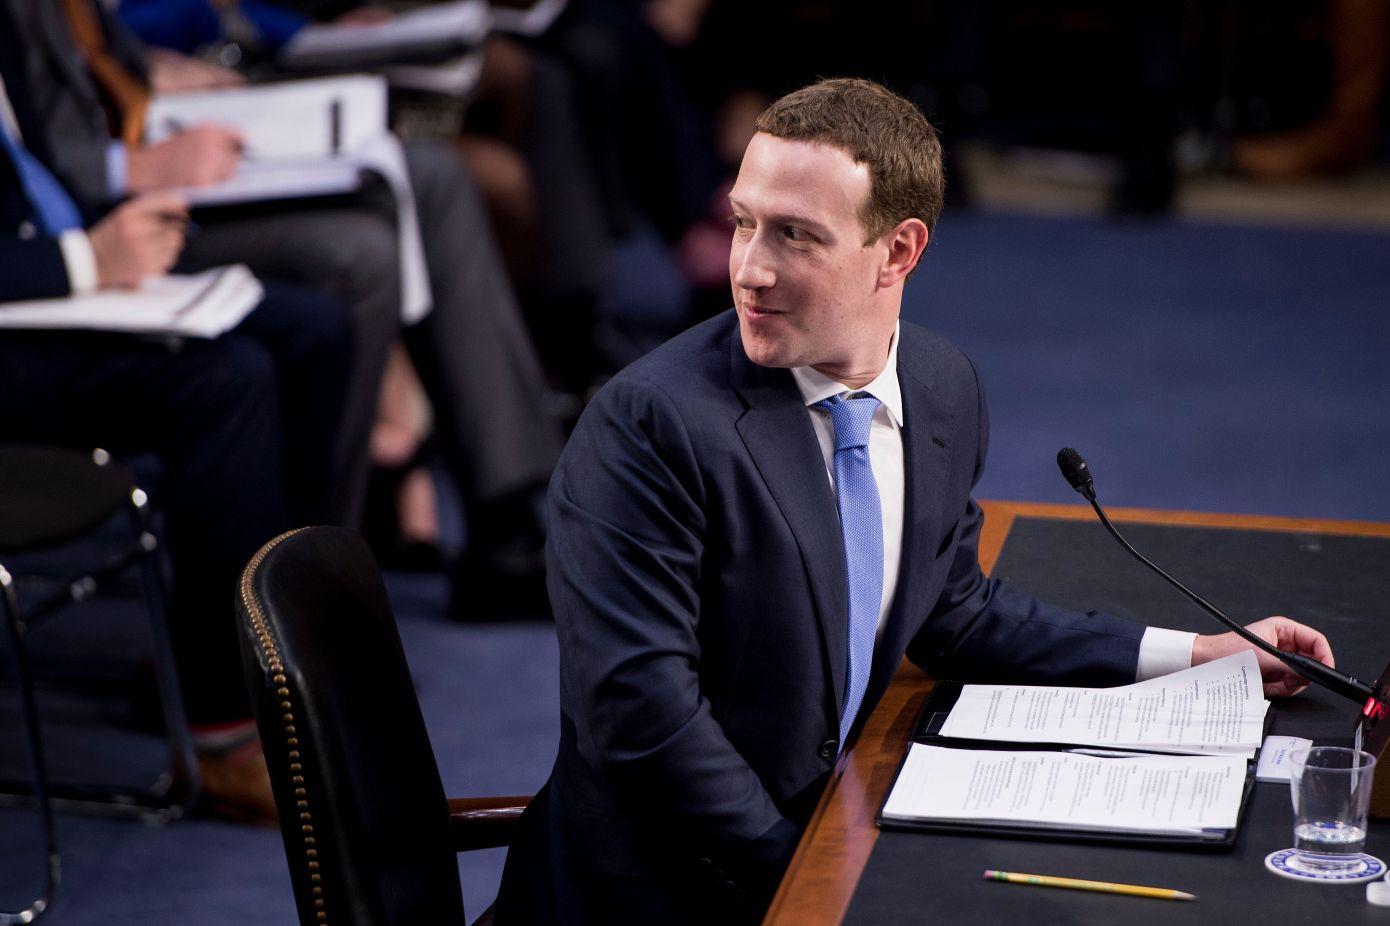 https://anysizedealsweek.com/wp-content/uploads/2020/12/Mark-Zuckerberg.jpeg